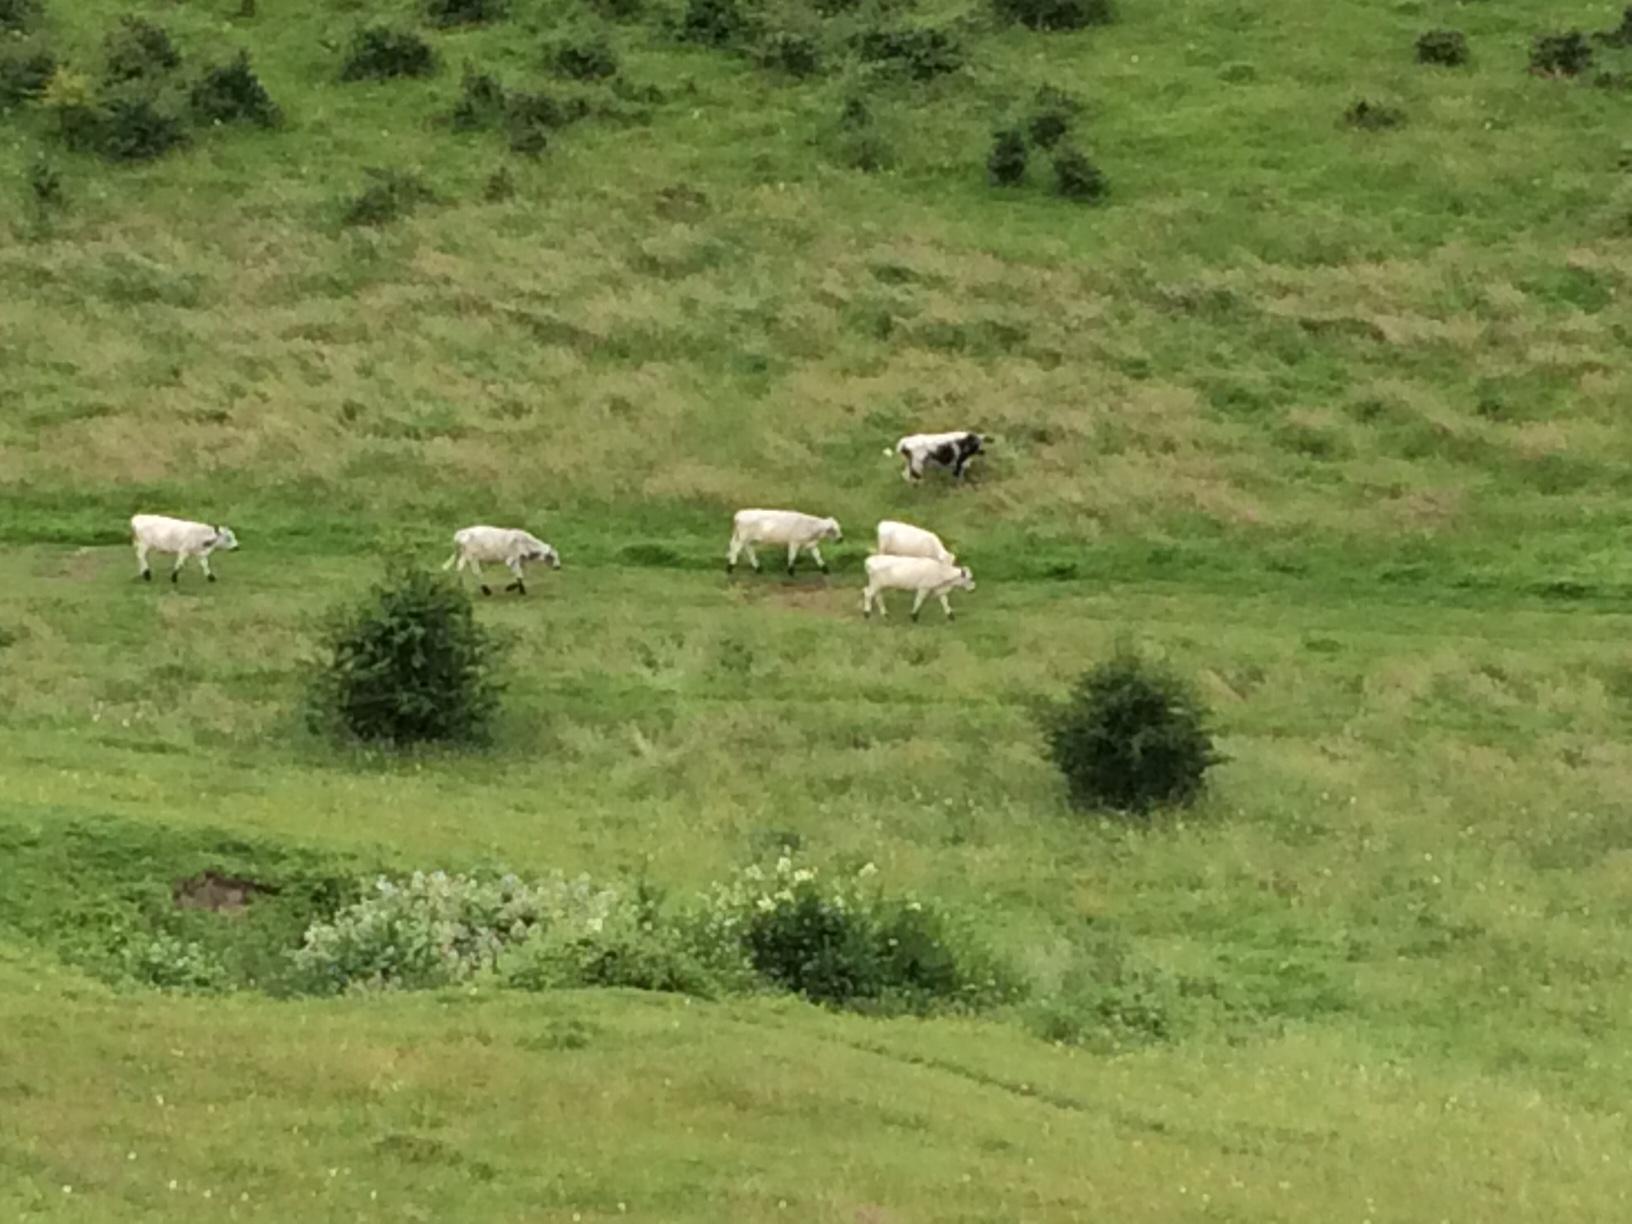 Cattle roaming on Whiteshute Ridge in Winchester